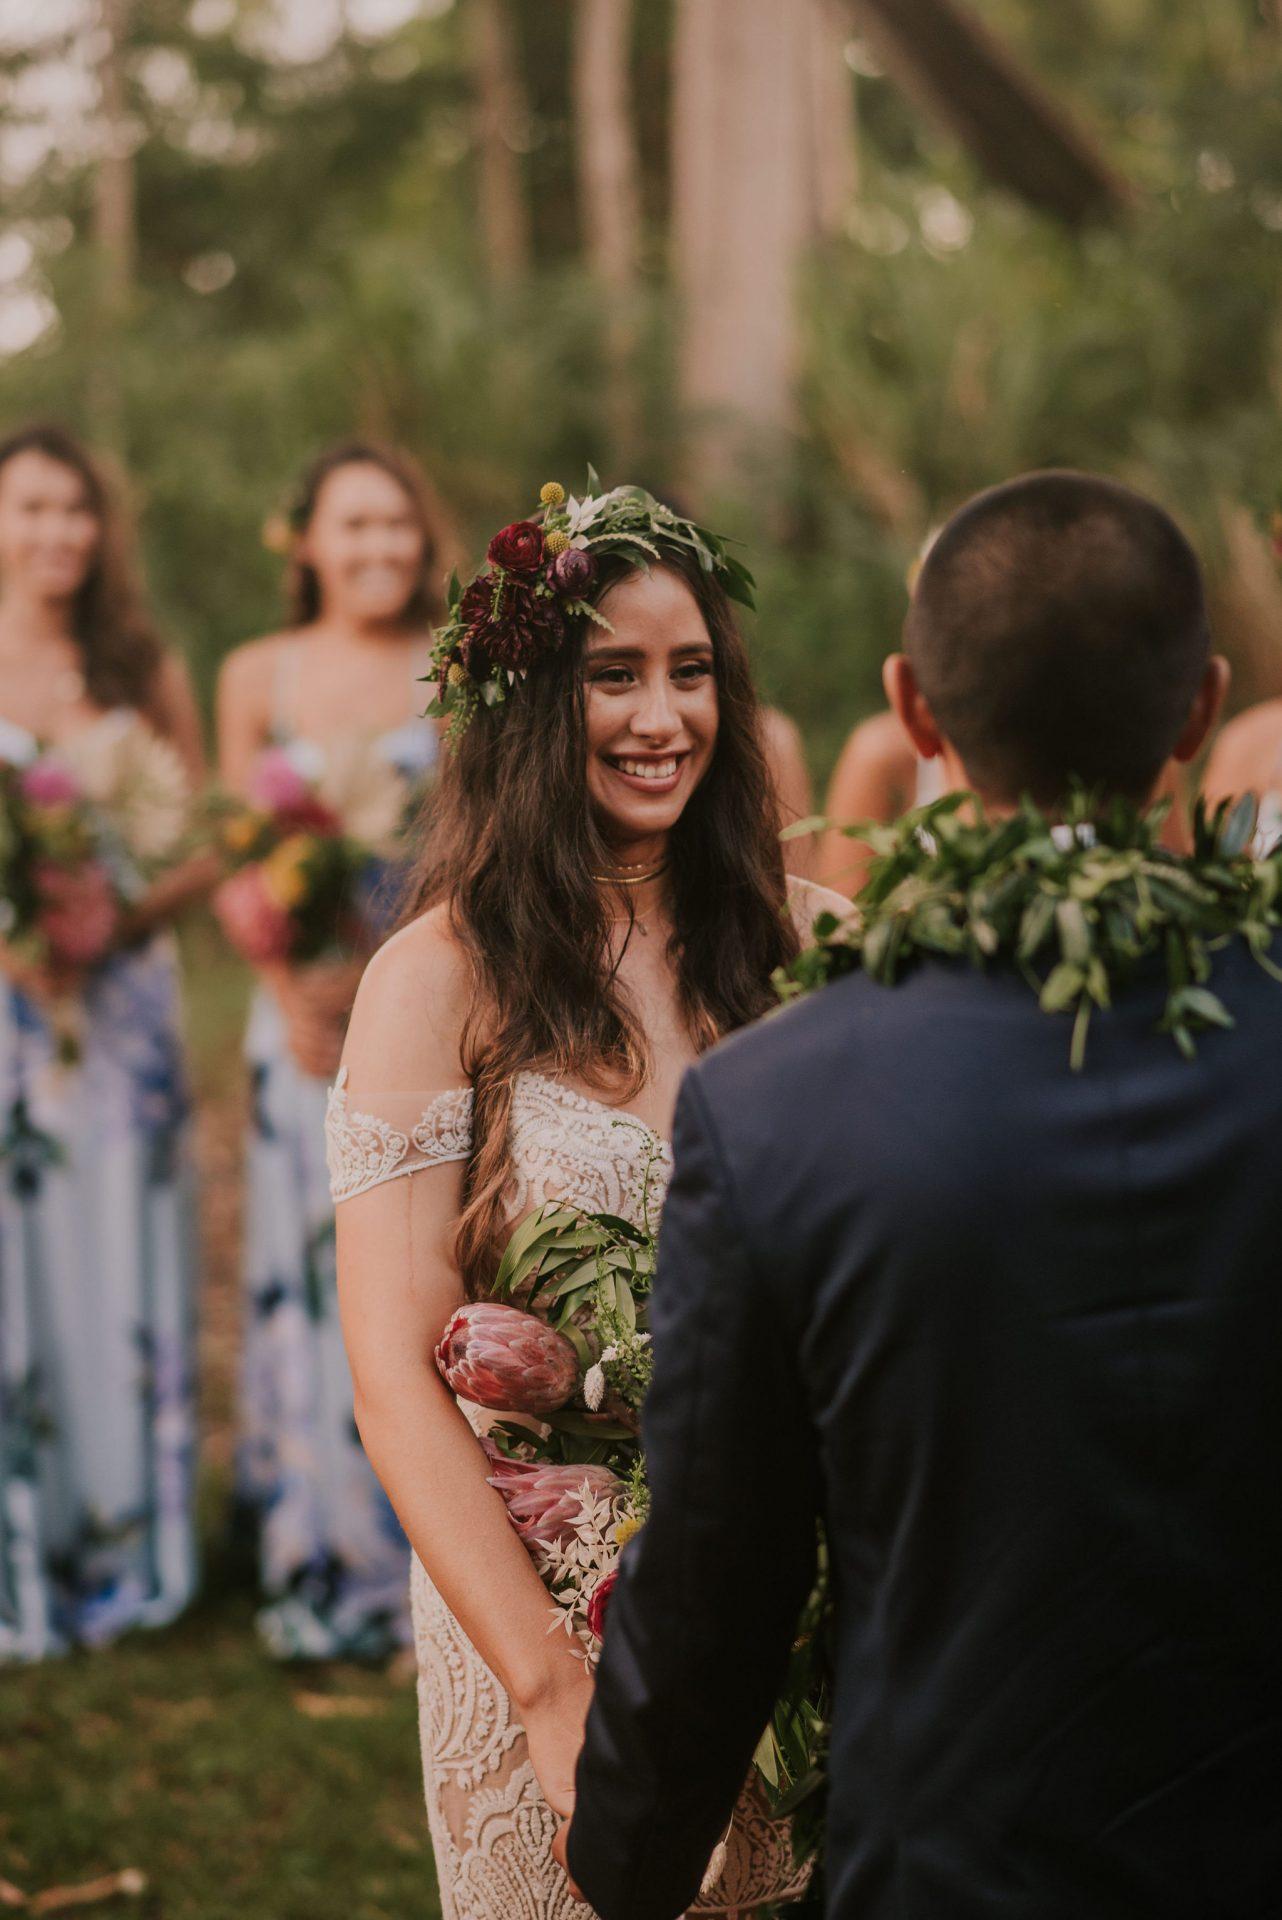 Kalee in the Tara Lauren Winslow lace bridal gown